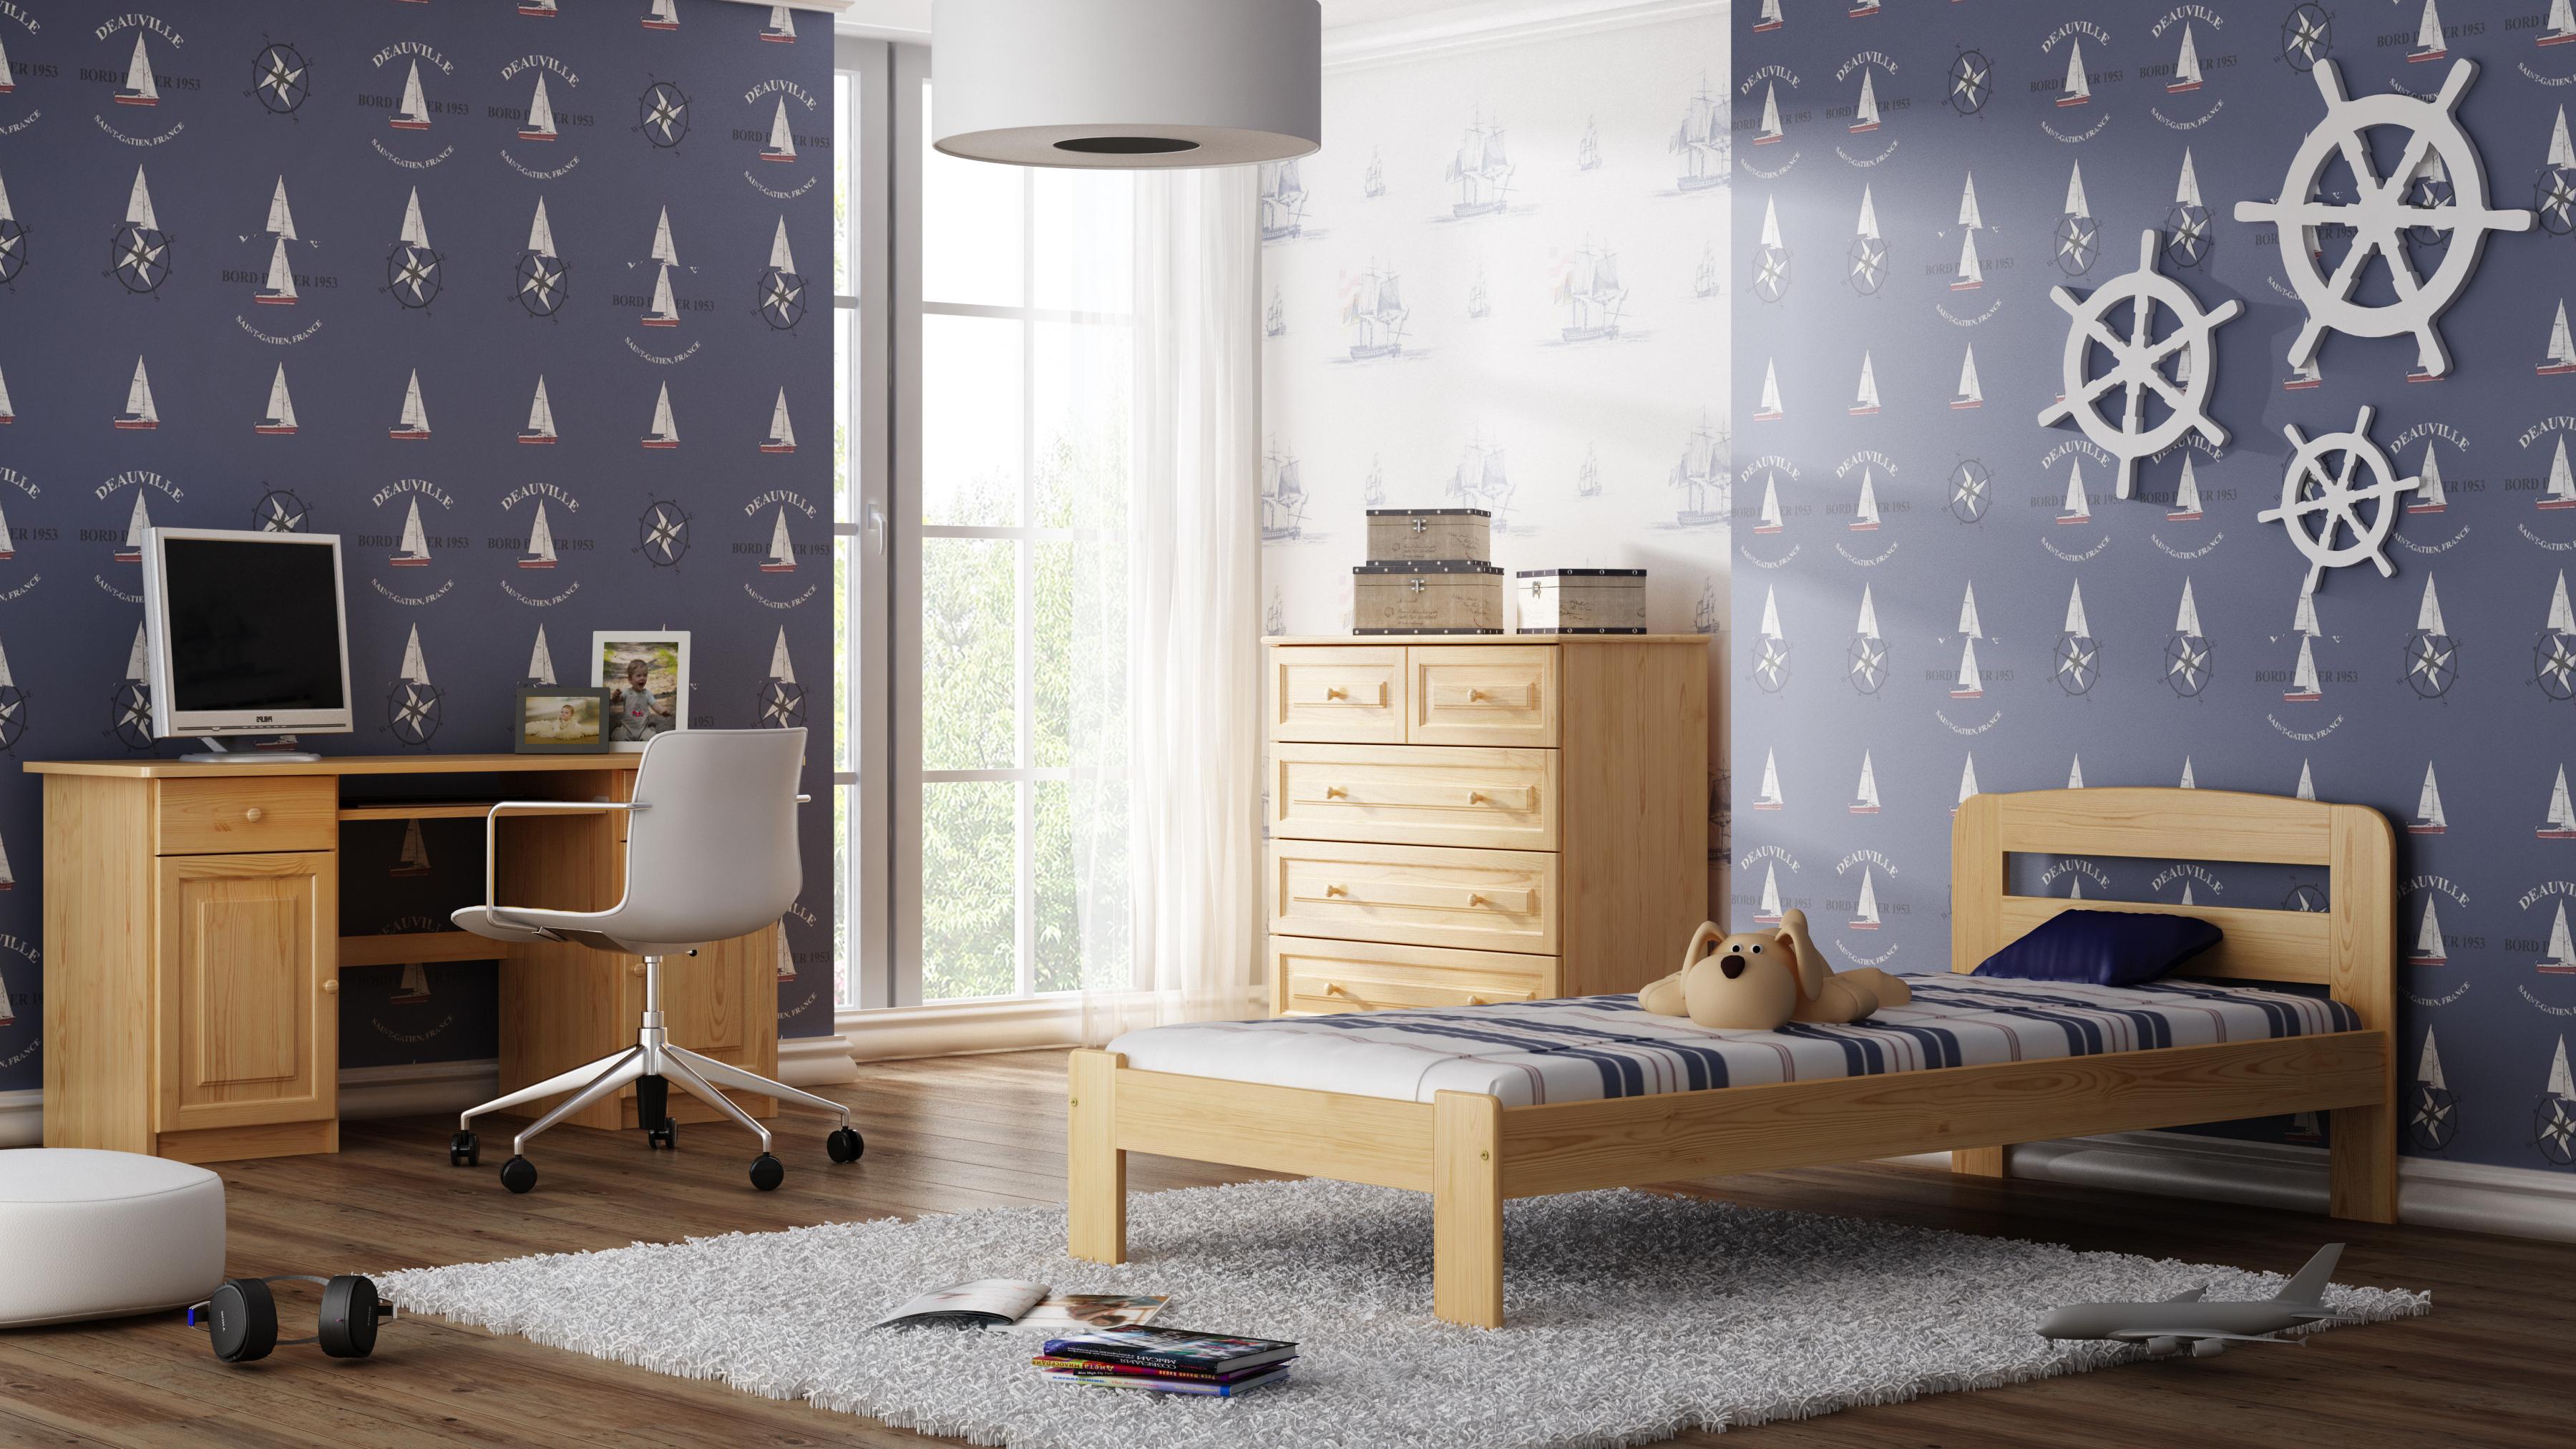 ehebett mit lattenrost jugendbett g stebett 90x200 einzelbett 140x200 doppelbett ebay. Black Bedroom Furniture Sets. Home Design Ideas